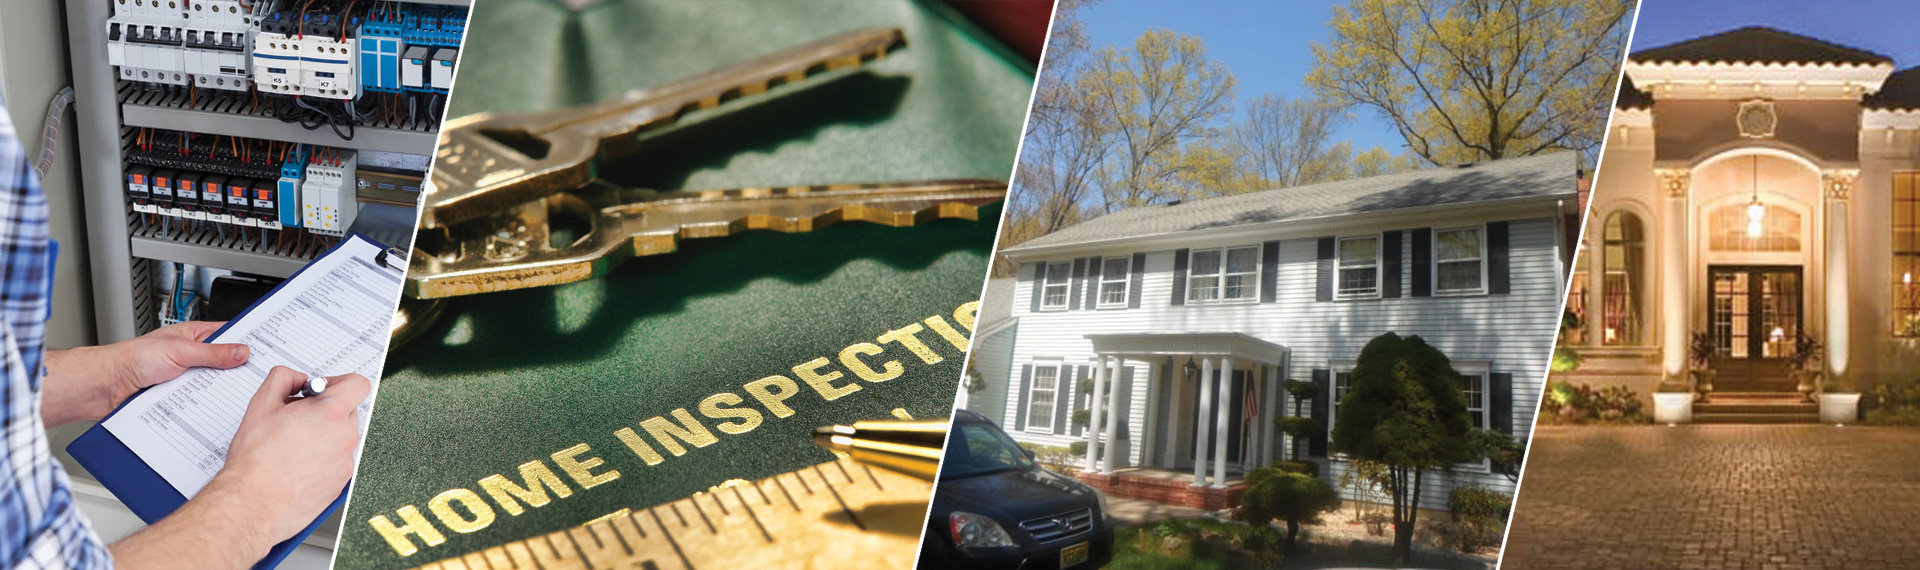 AAA House Doctors Engineers & Home Inspectors Woodbridge NJ